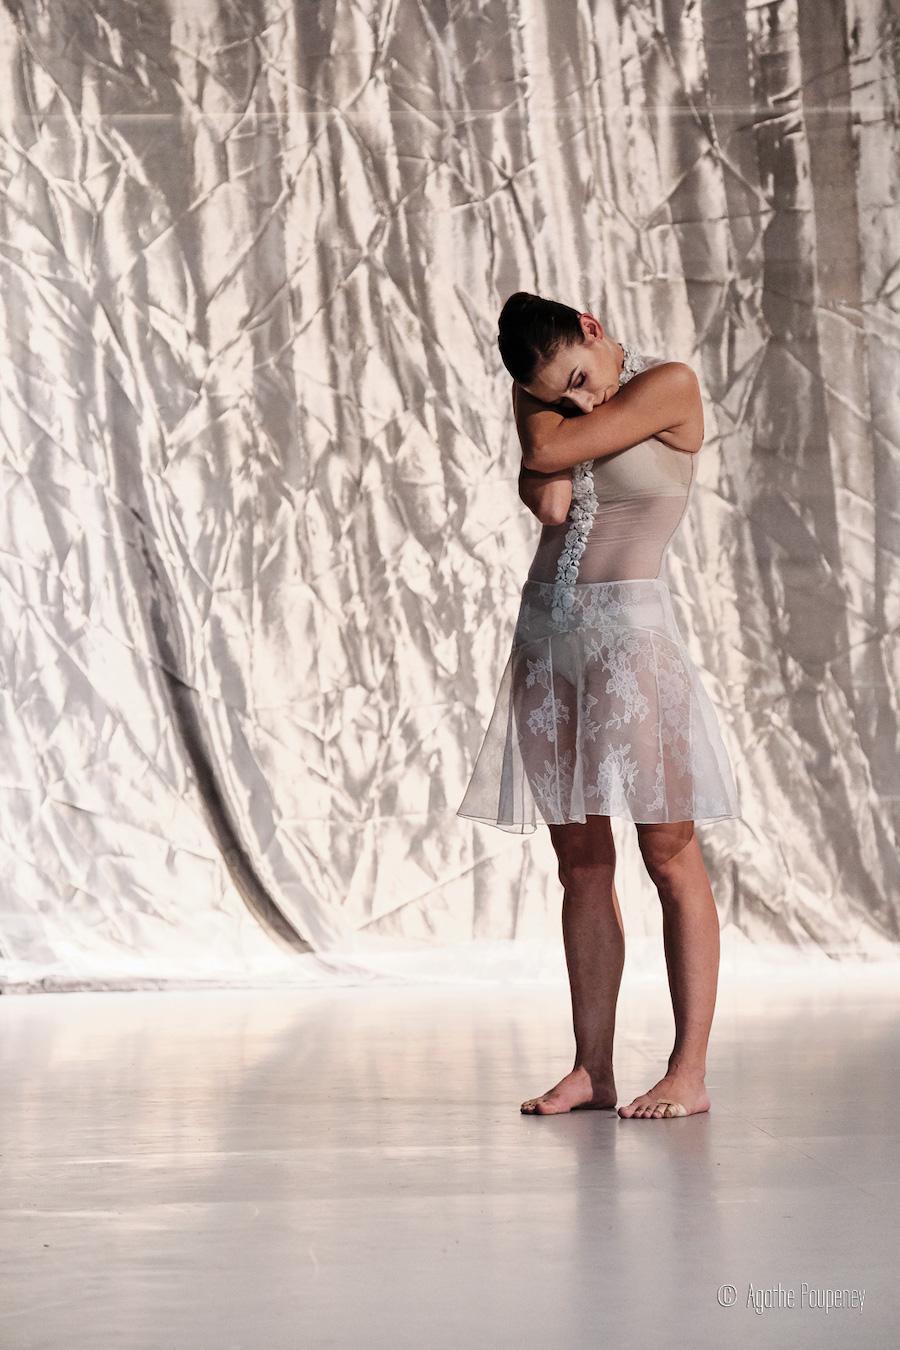 lac des cygnes radhouane el meddeb ballet opéra du rhin